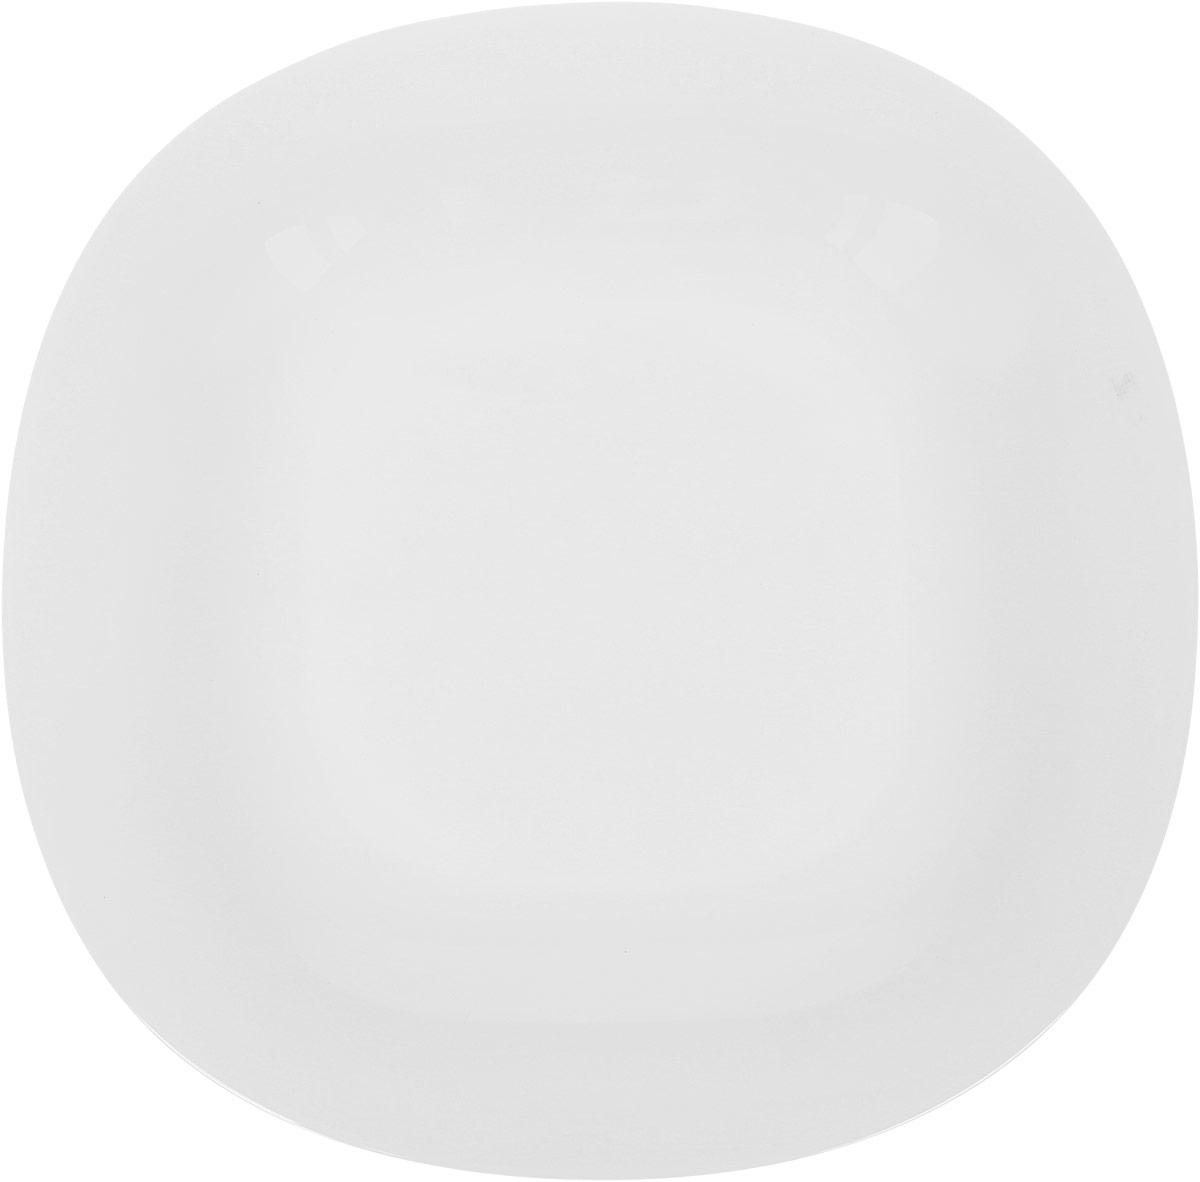 Тарелка обеденная Luminarc Carine White, 26 х 26 см салатник luminarc carine white диаметр 12 см